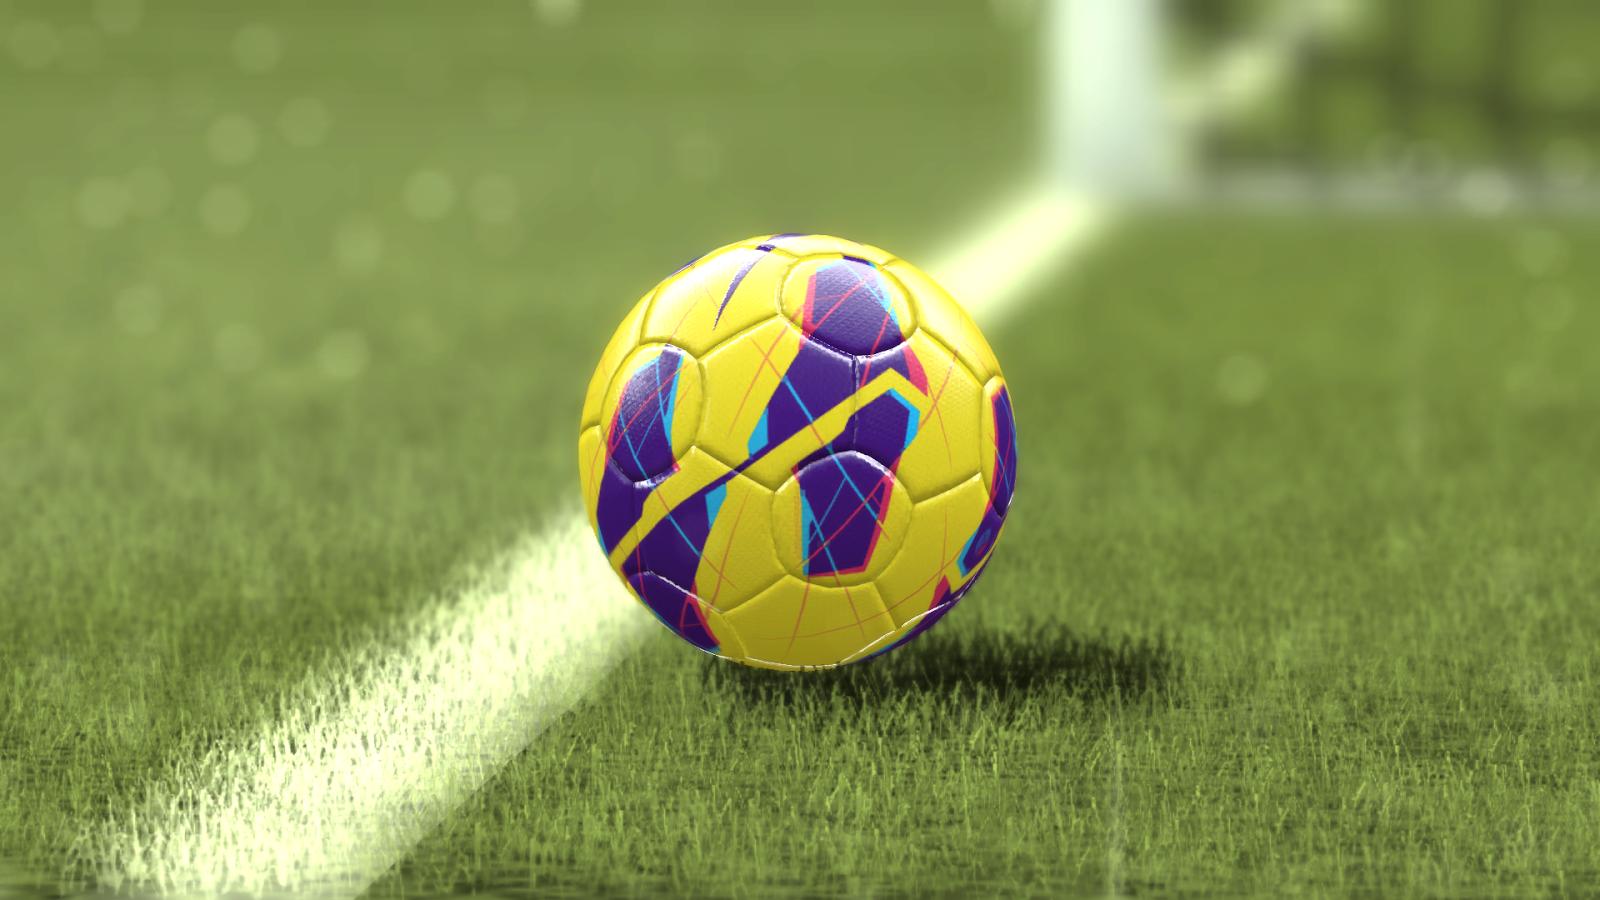 Football Wallpapers Desktop Background: Football Wallpapers Hd